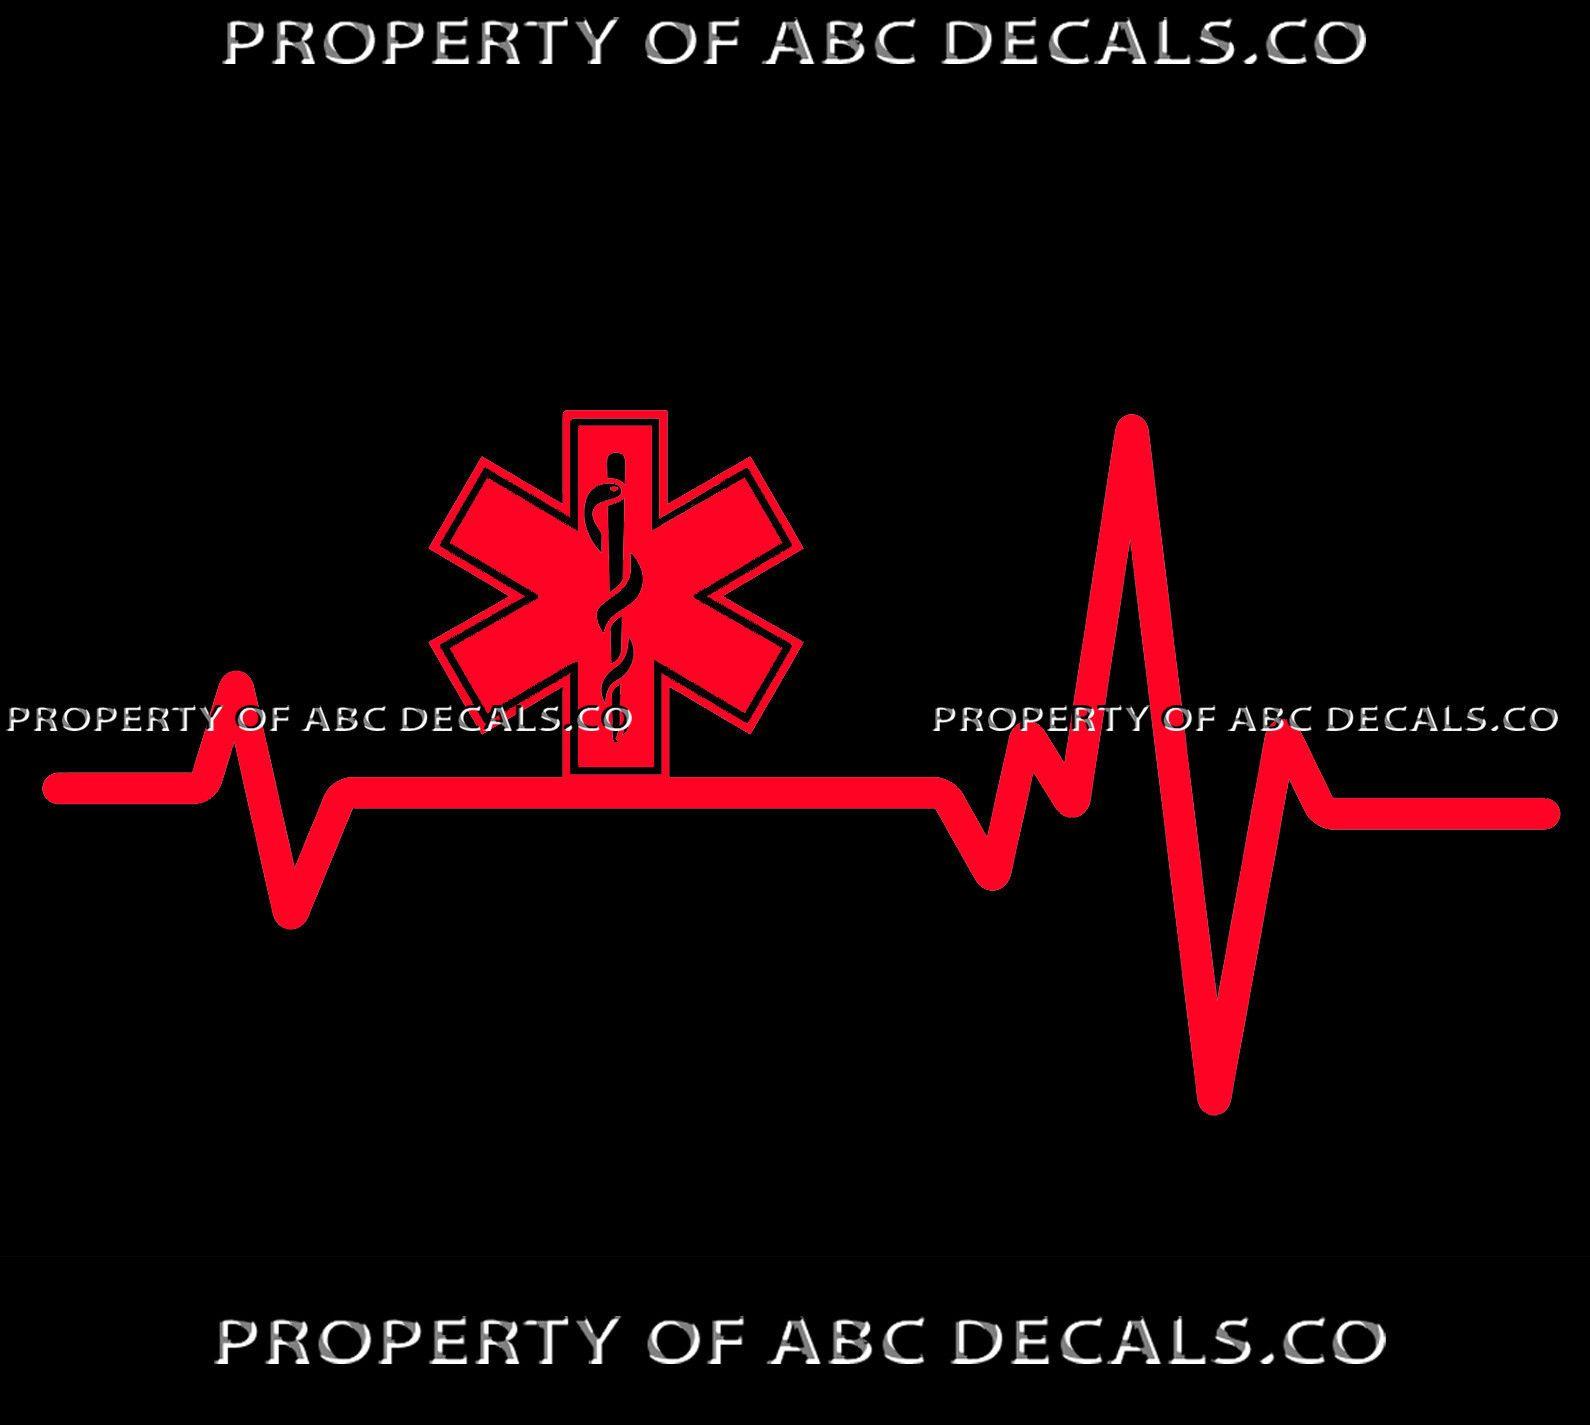 Vrs Heart Beat Line Star Of Life Emt Ambulance Medical Emergency Car Vinyl Decal Car Decals Vinyl Emergency Medical In A Heartbeat [ 1425 x 1590 Pixel ]